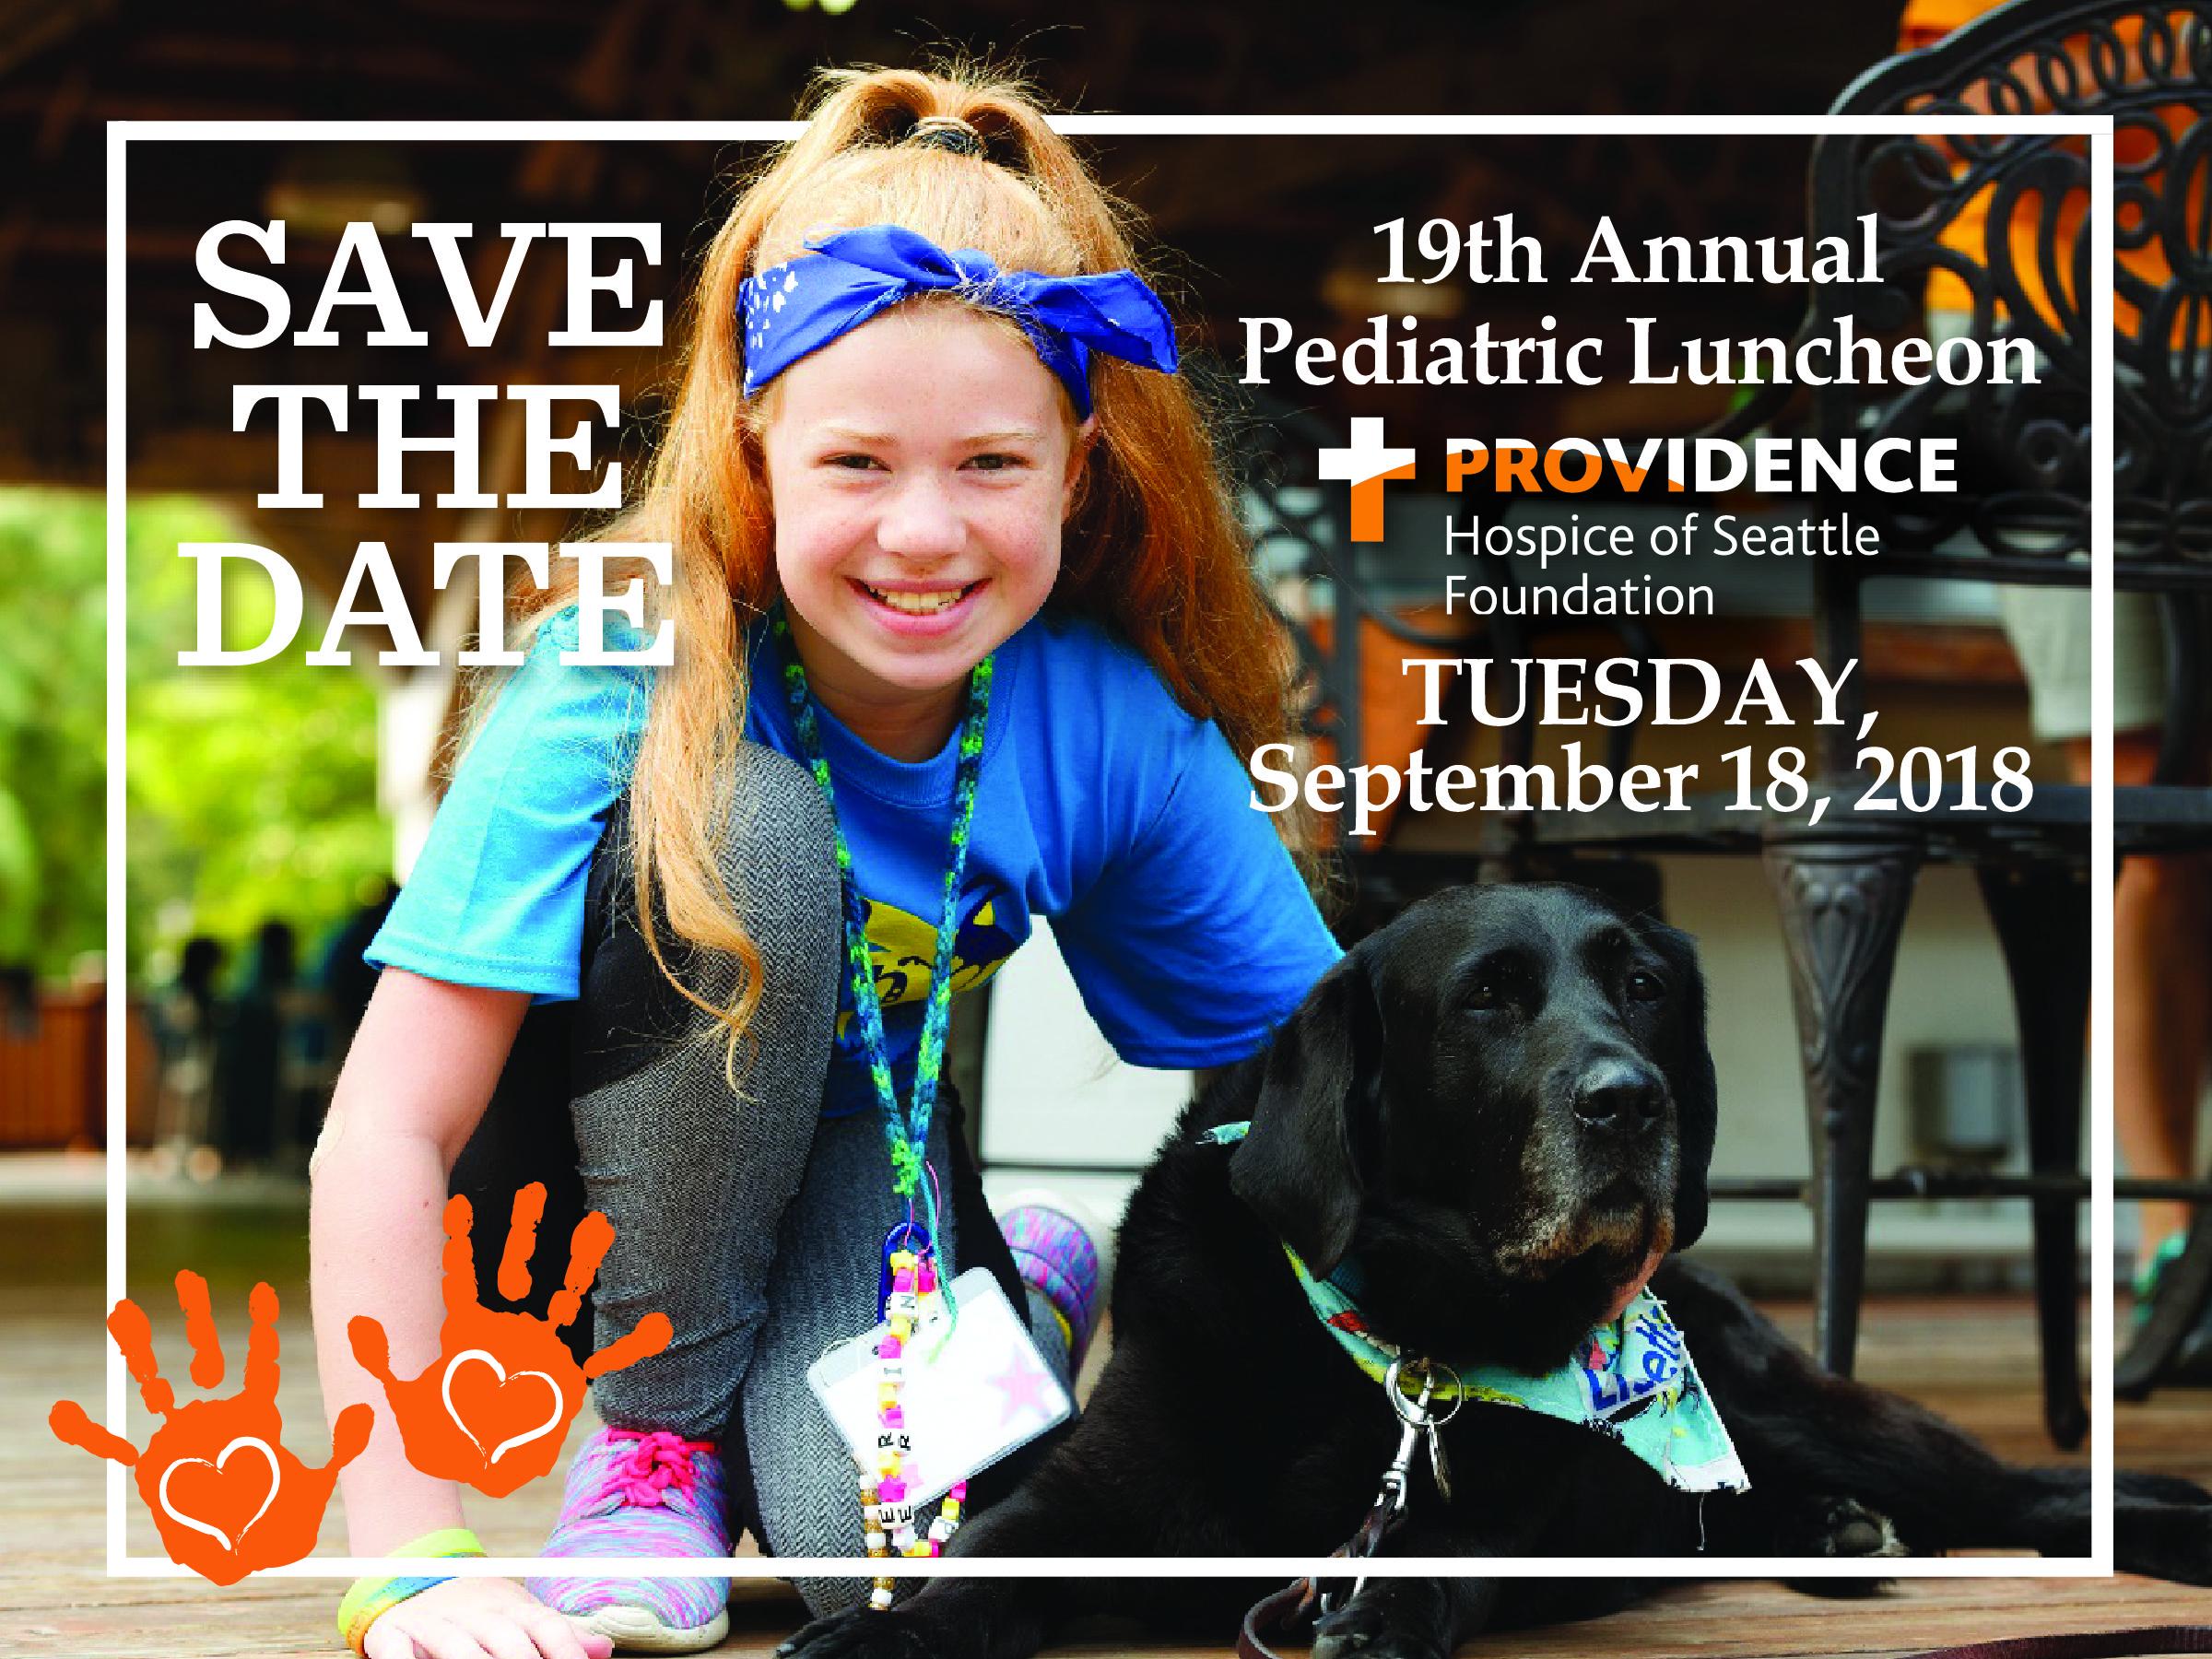 Pediatric Luncheon save-the-date2018-03.jpg